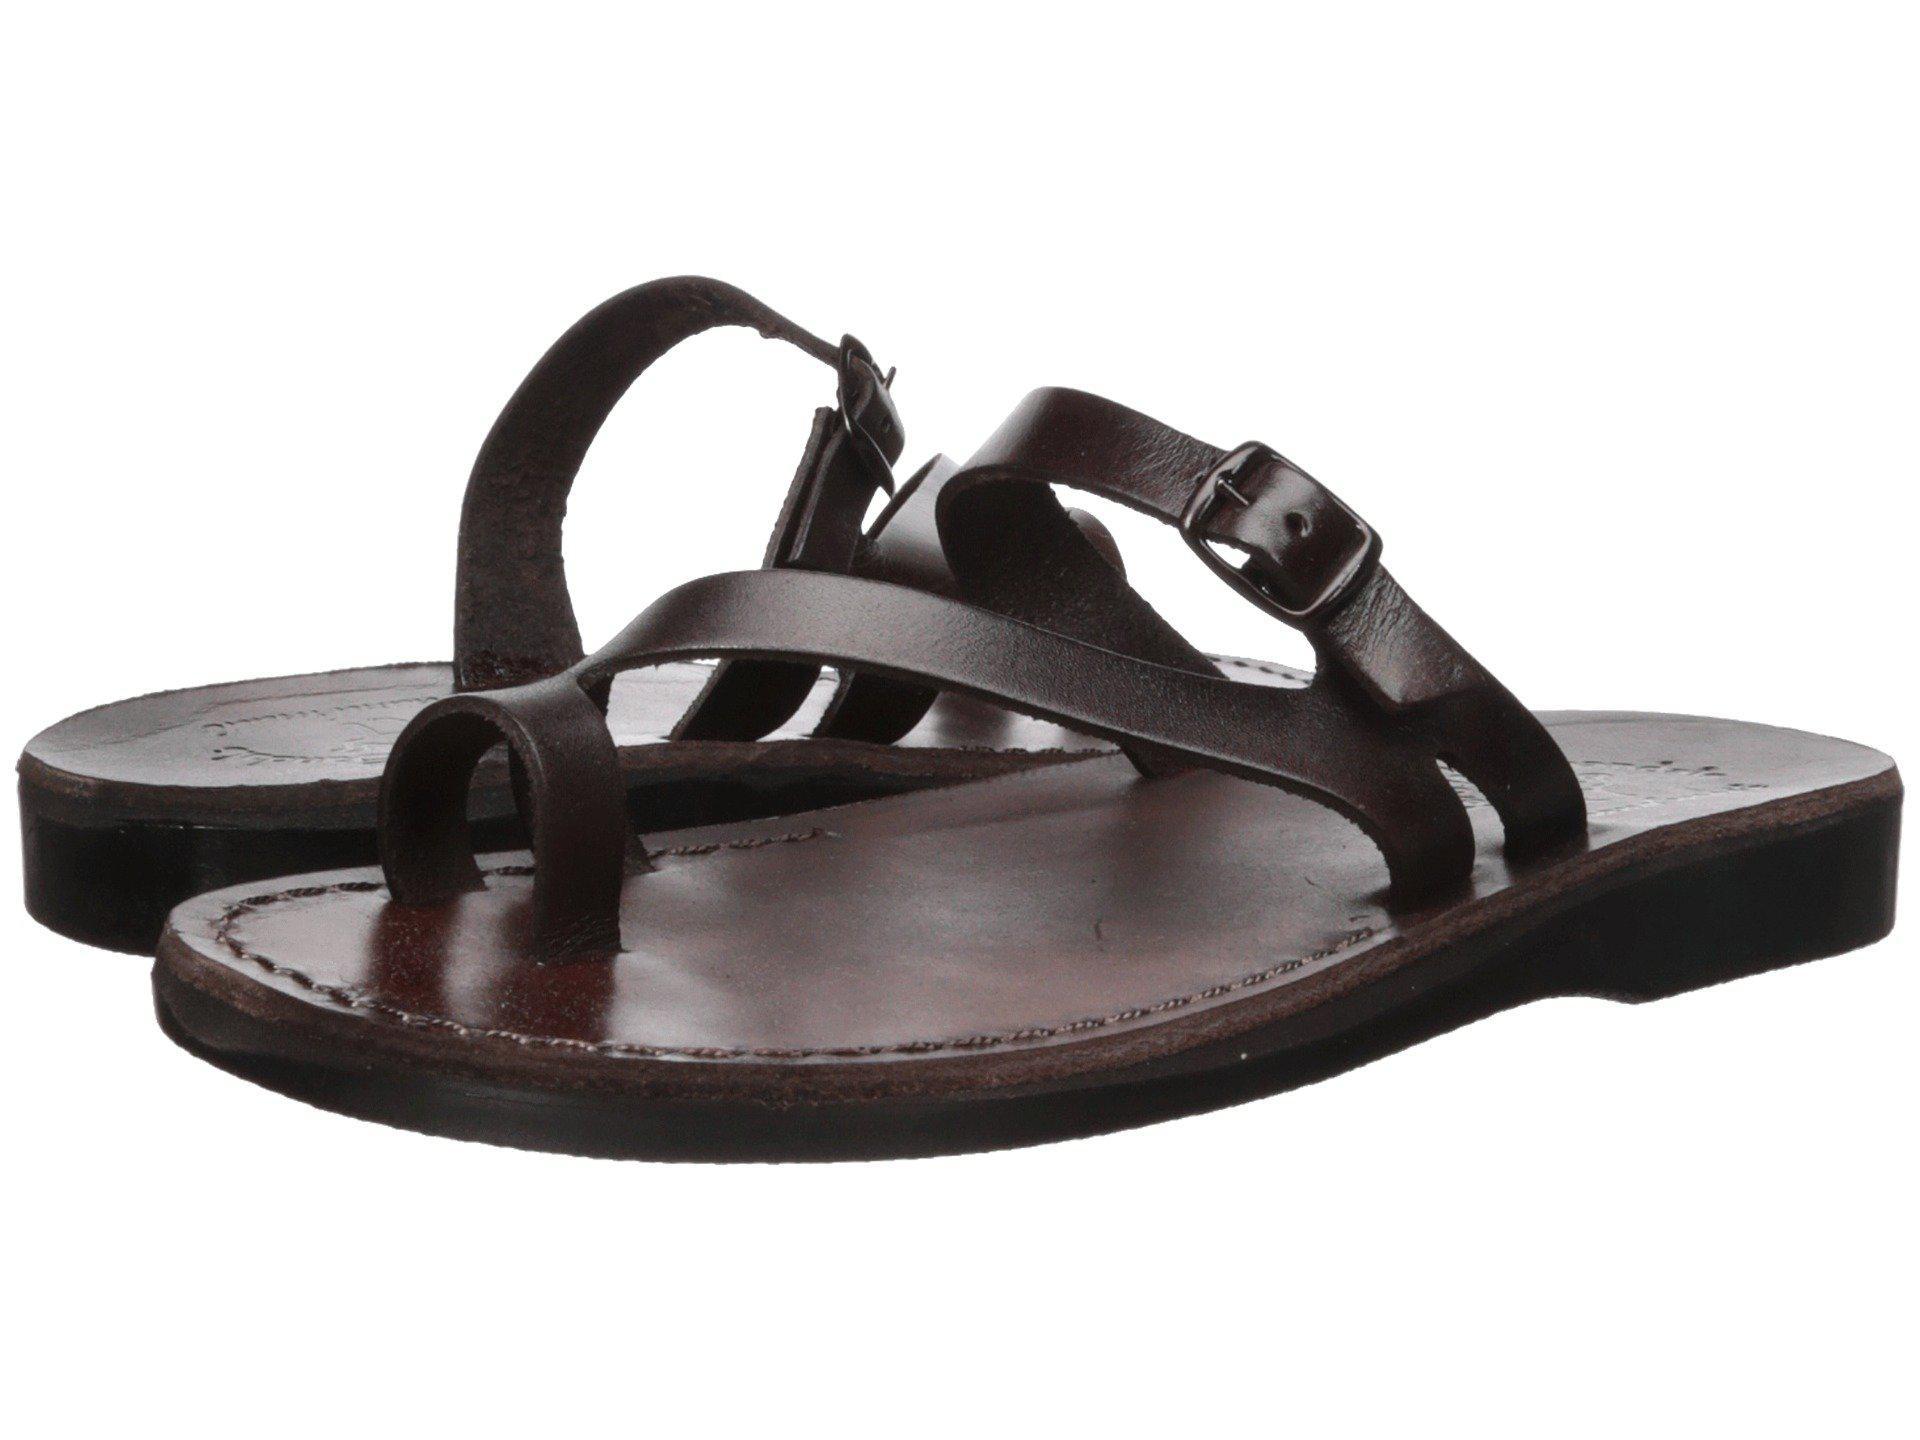 c9360ebf0f969 Lyst - Jerusalem Sandals Nuri (black) Women s Sandals in Brown